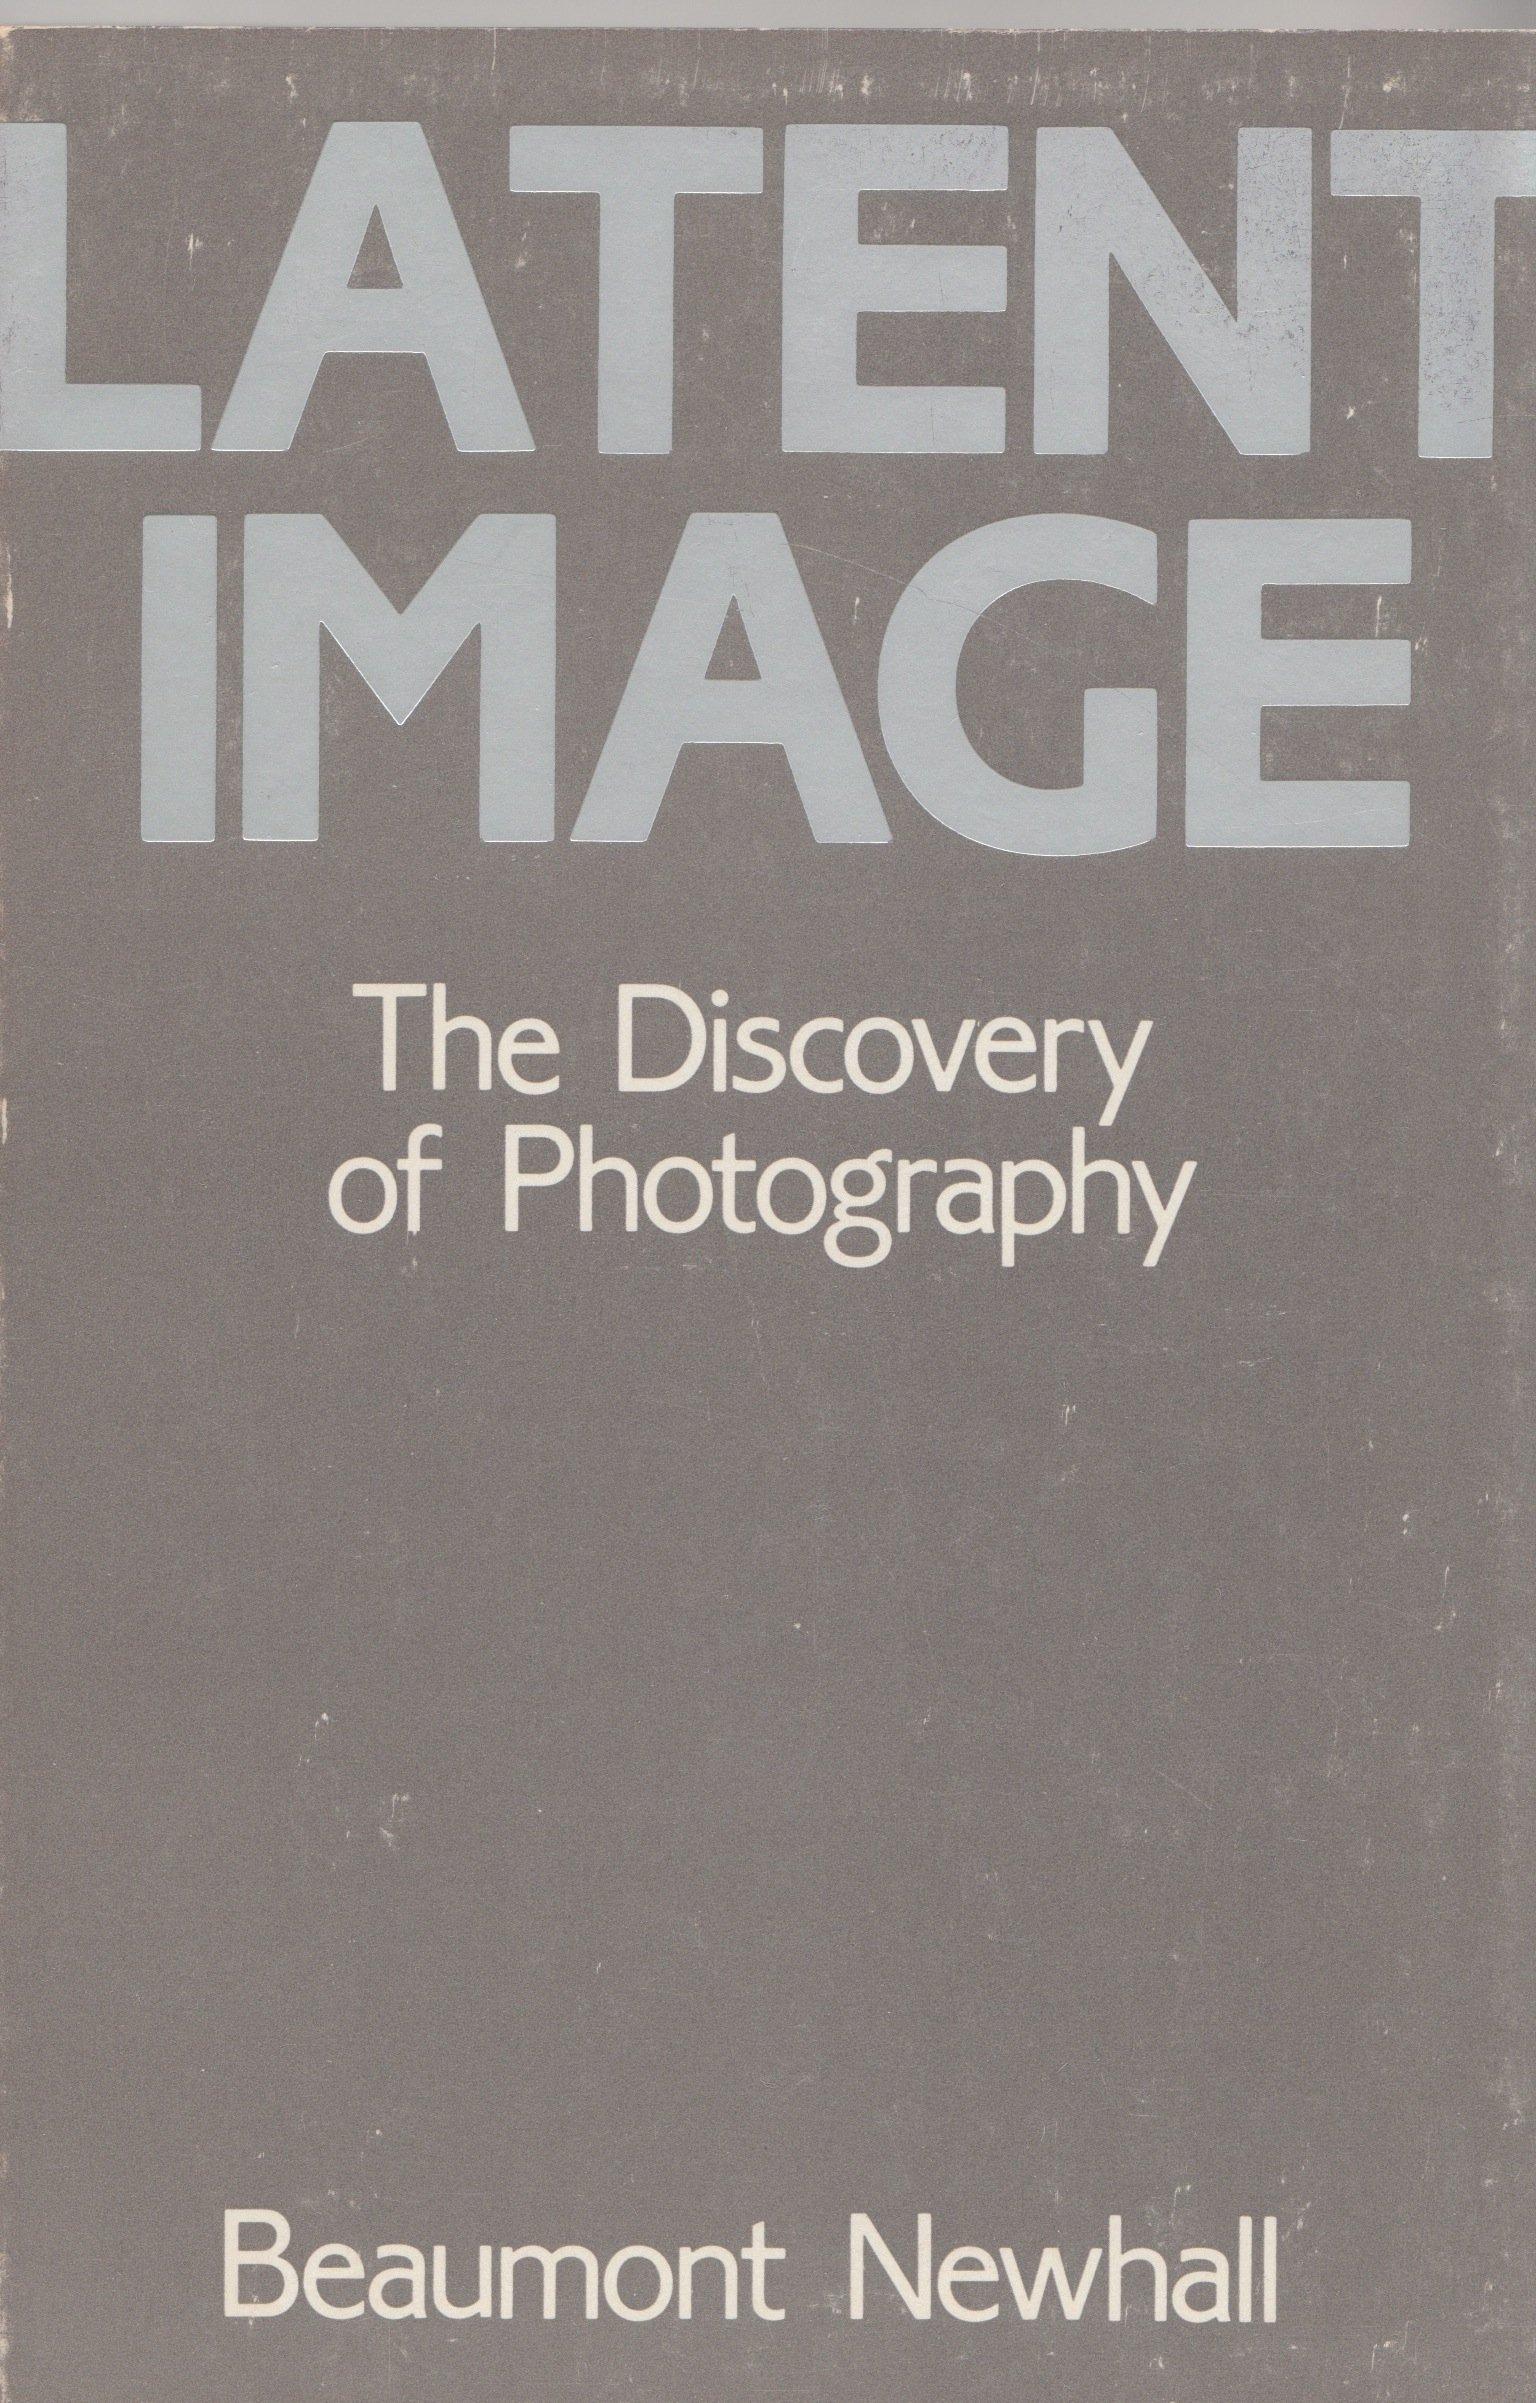 Latent Image: The Discovery of Photography: Amazon.es: Libros en idiomas extranjeros